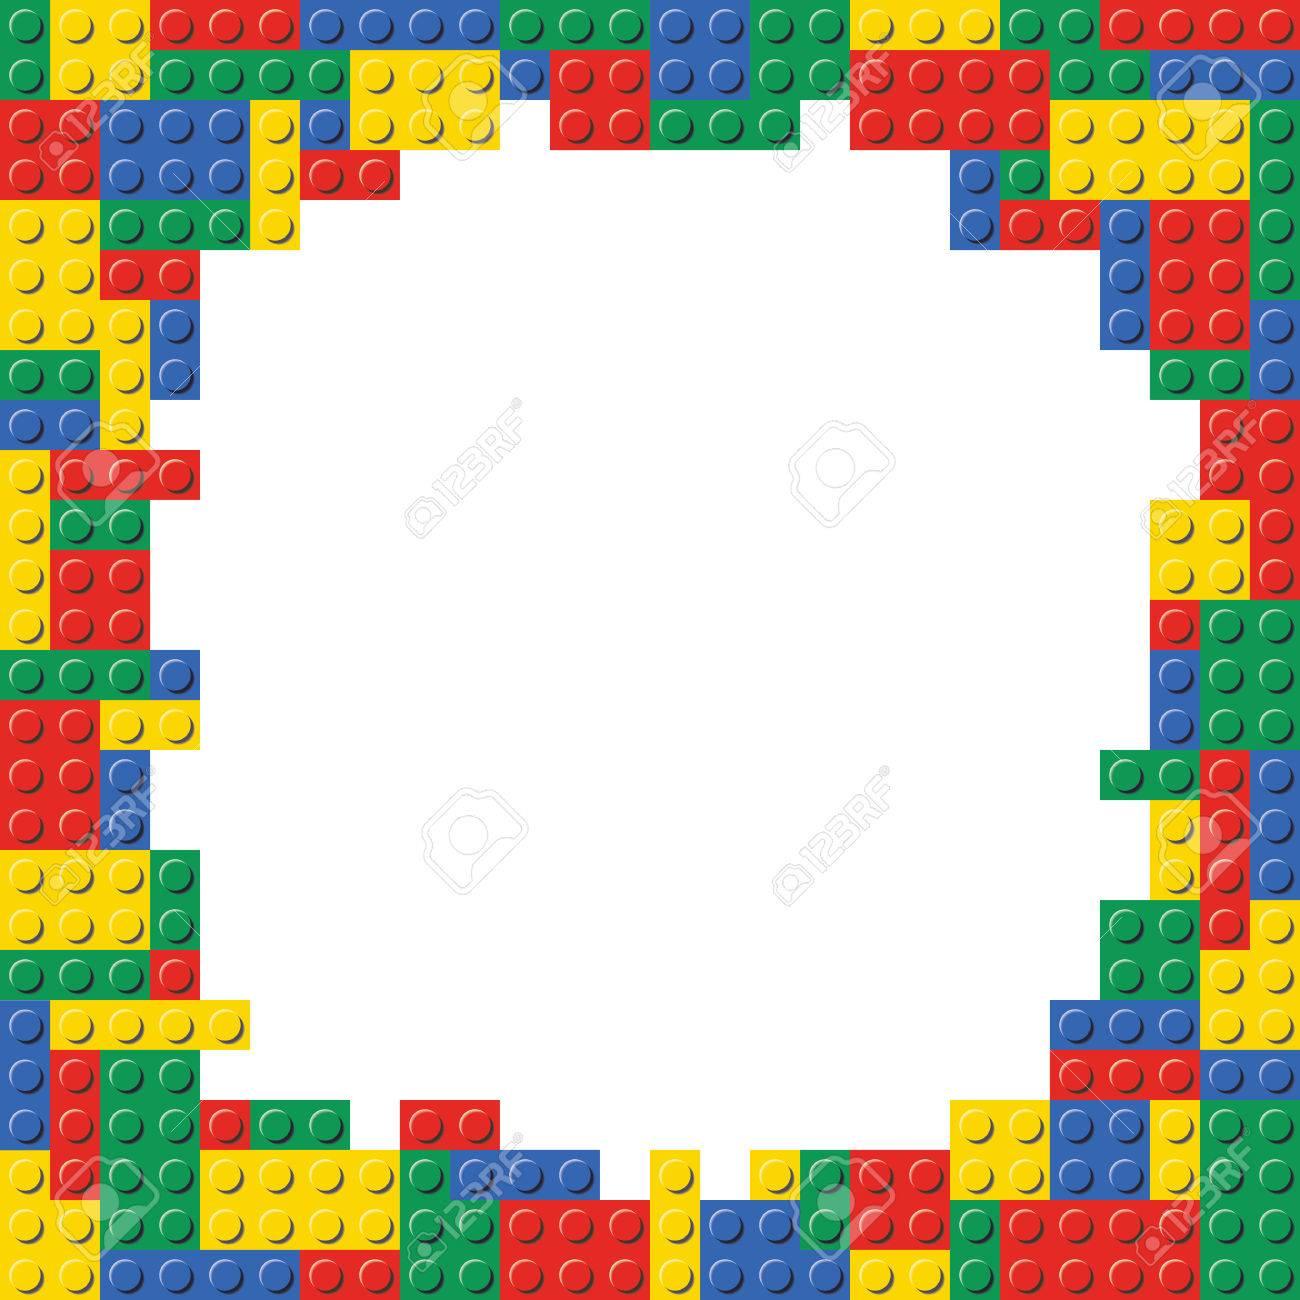 Lego building blocks brick border frame background pattern texture lego building blocks brick border frame background pattern texture template stock vector 85239513 stopboris Gallery